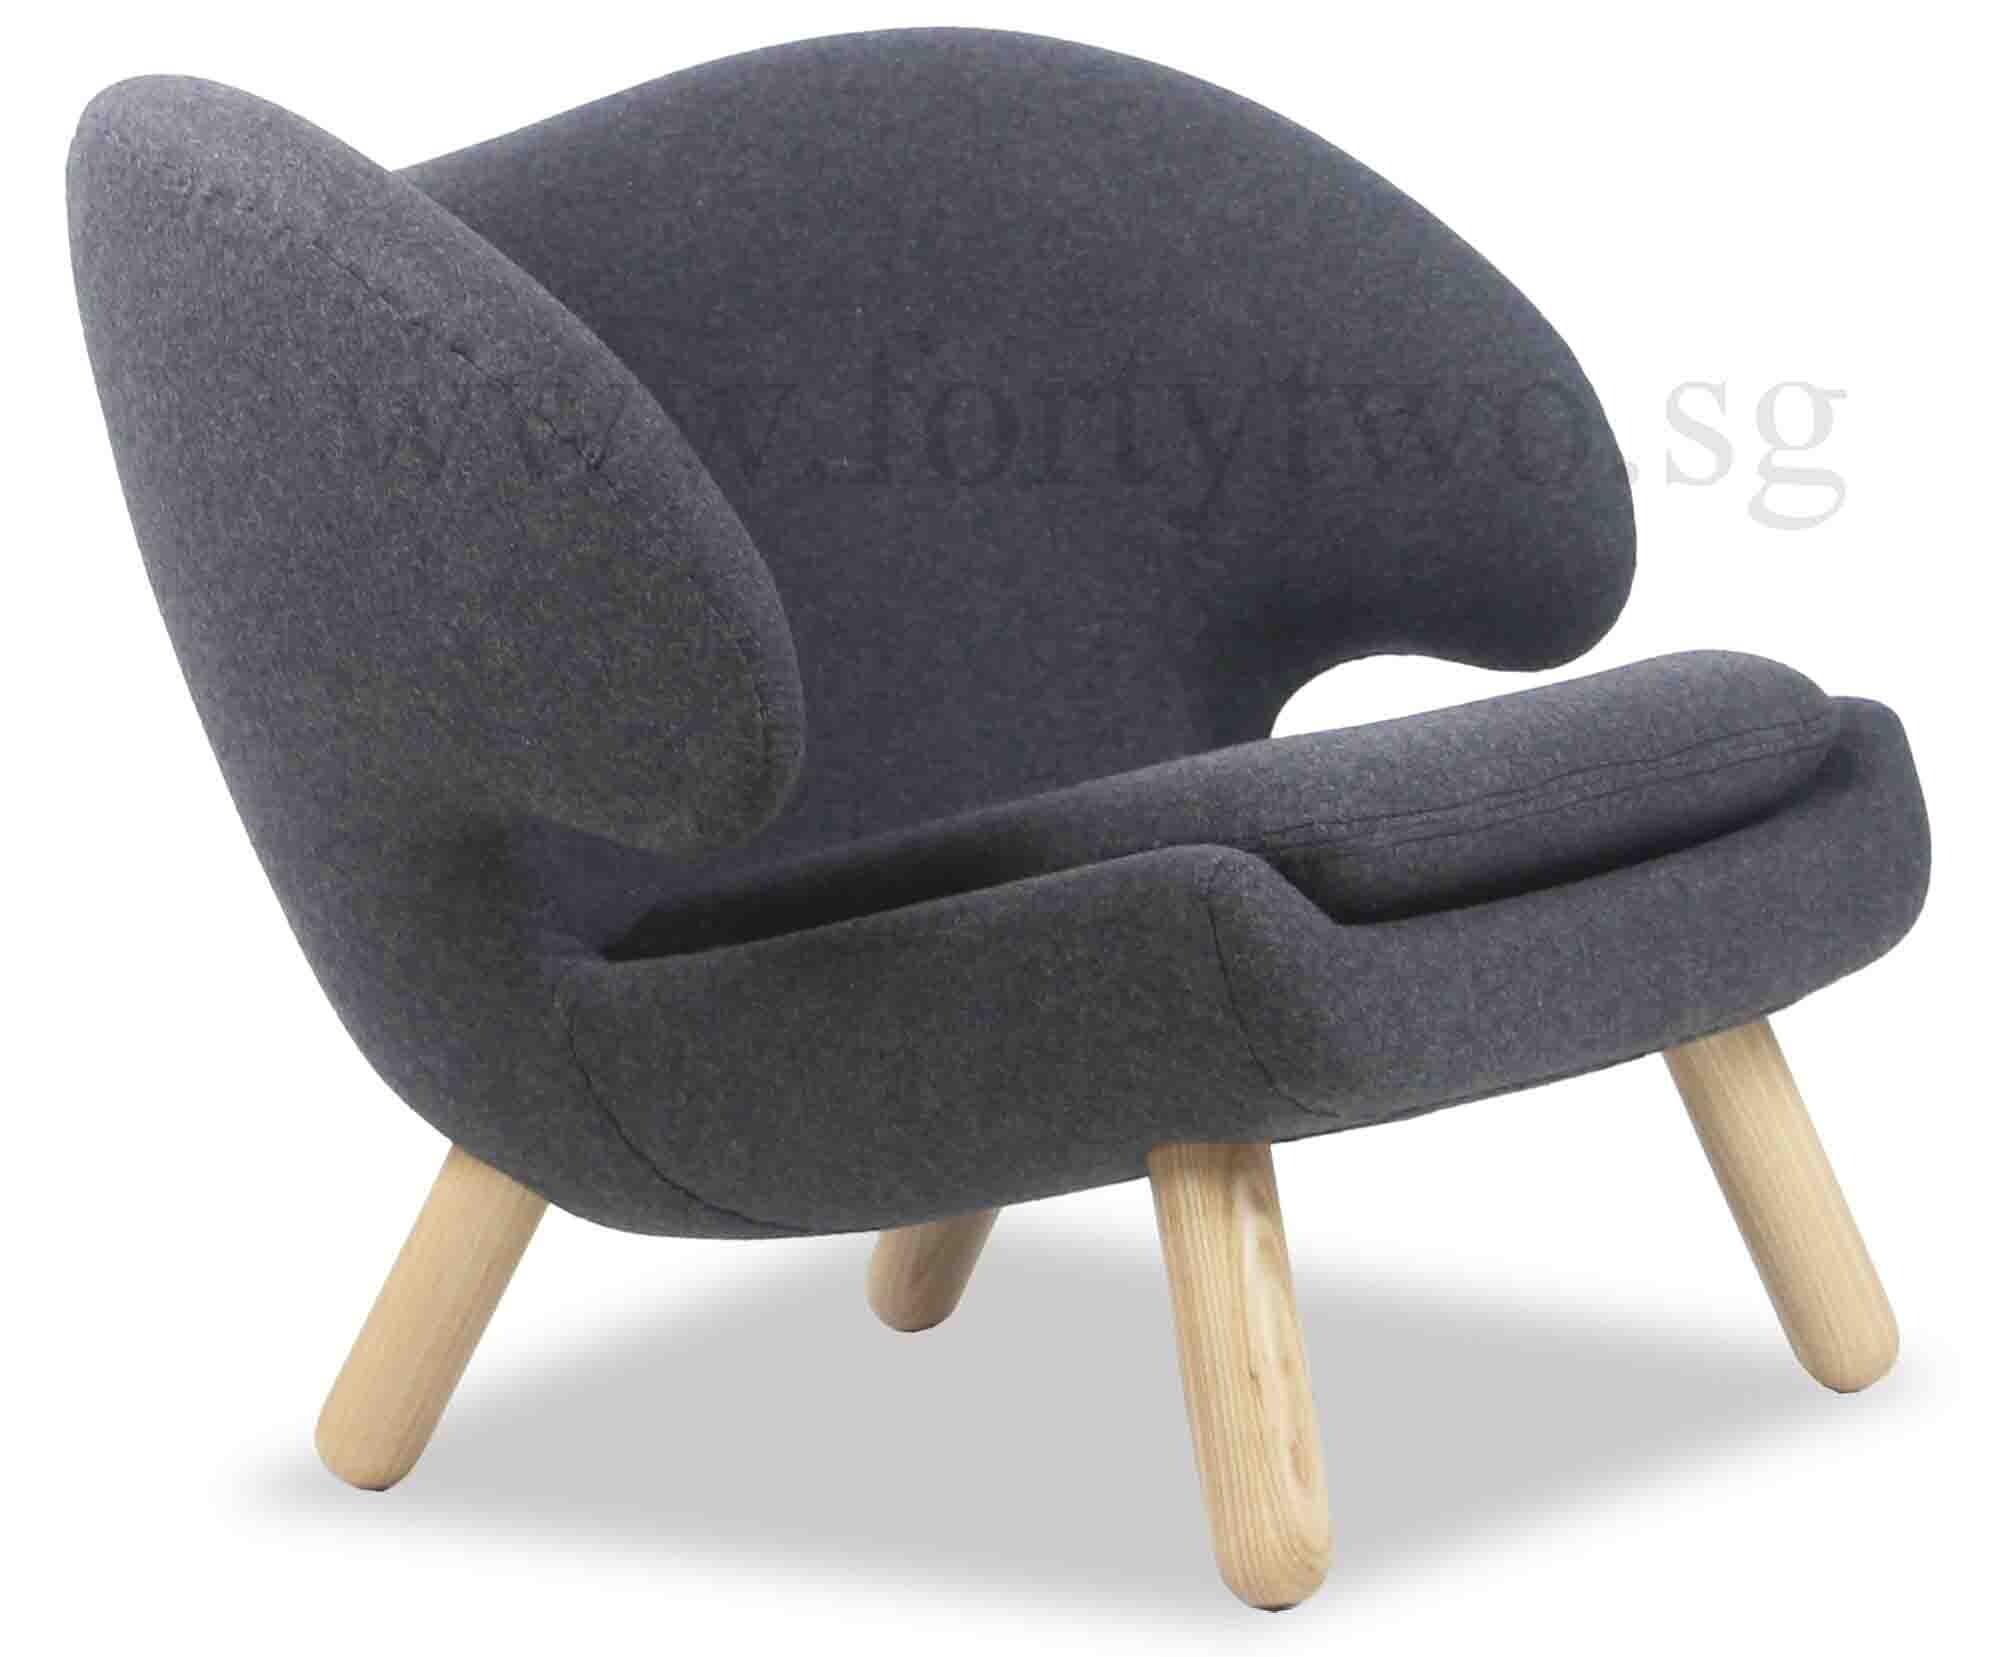 Designer replica pelican chair in charcoal furniture for Replica designer furniture usa